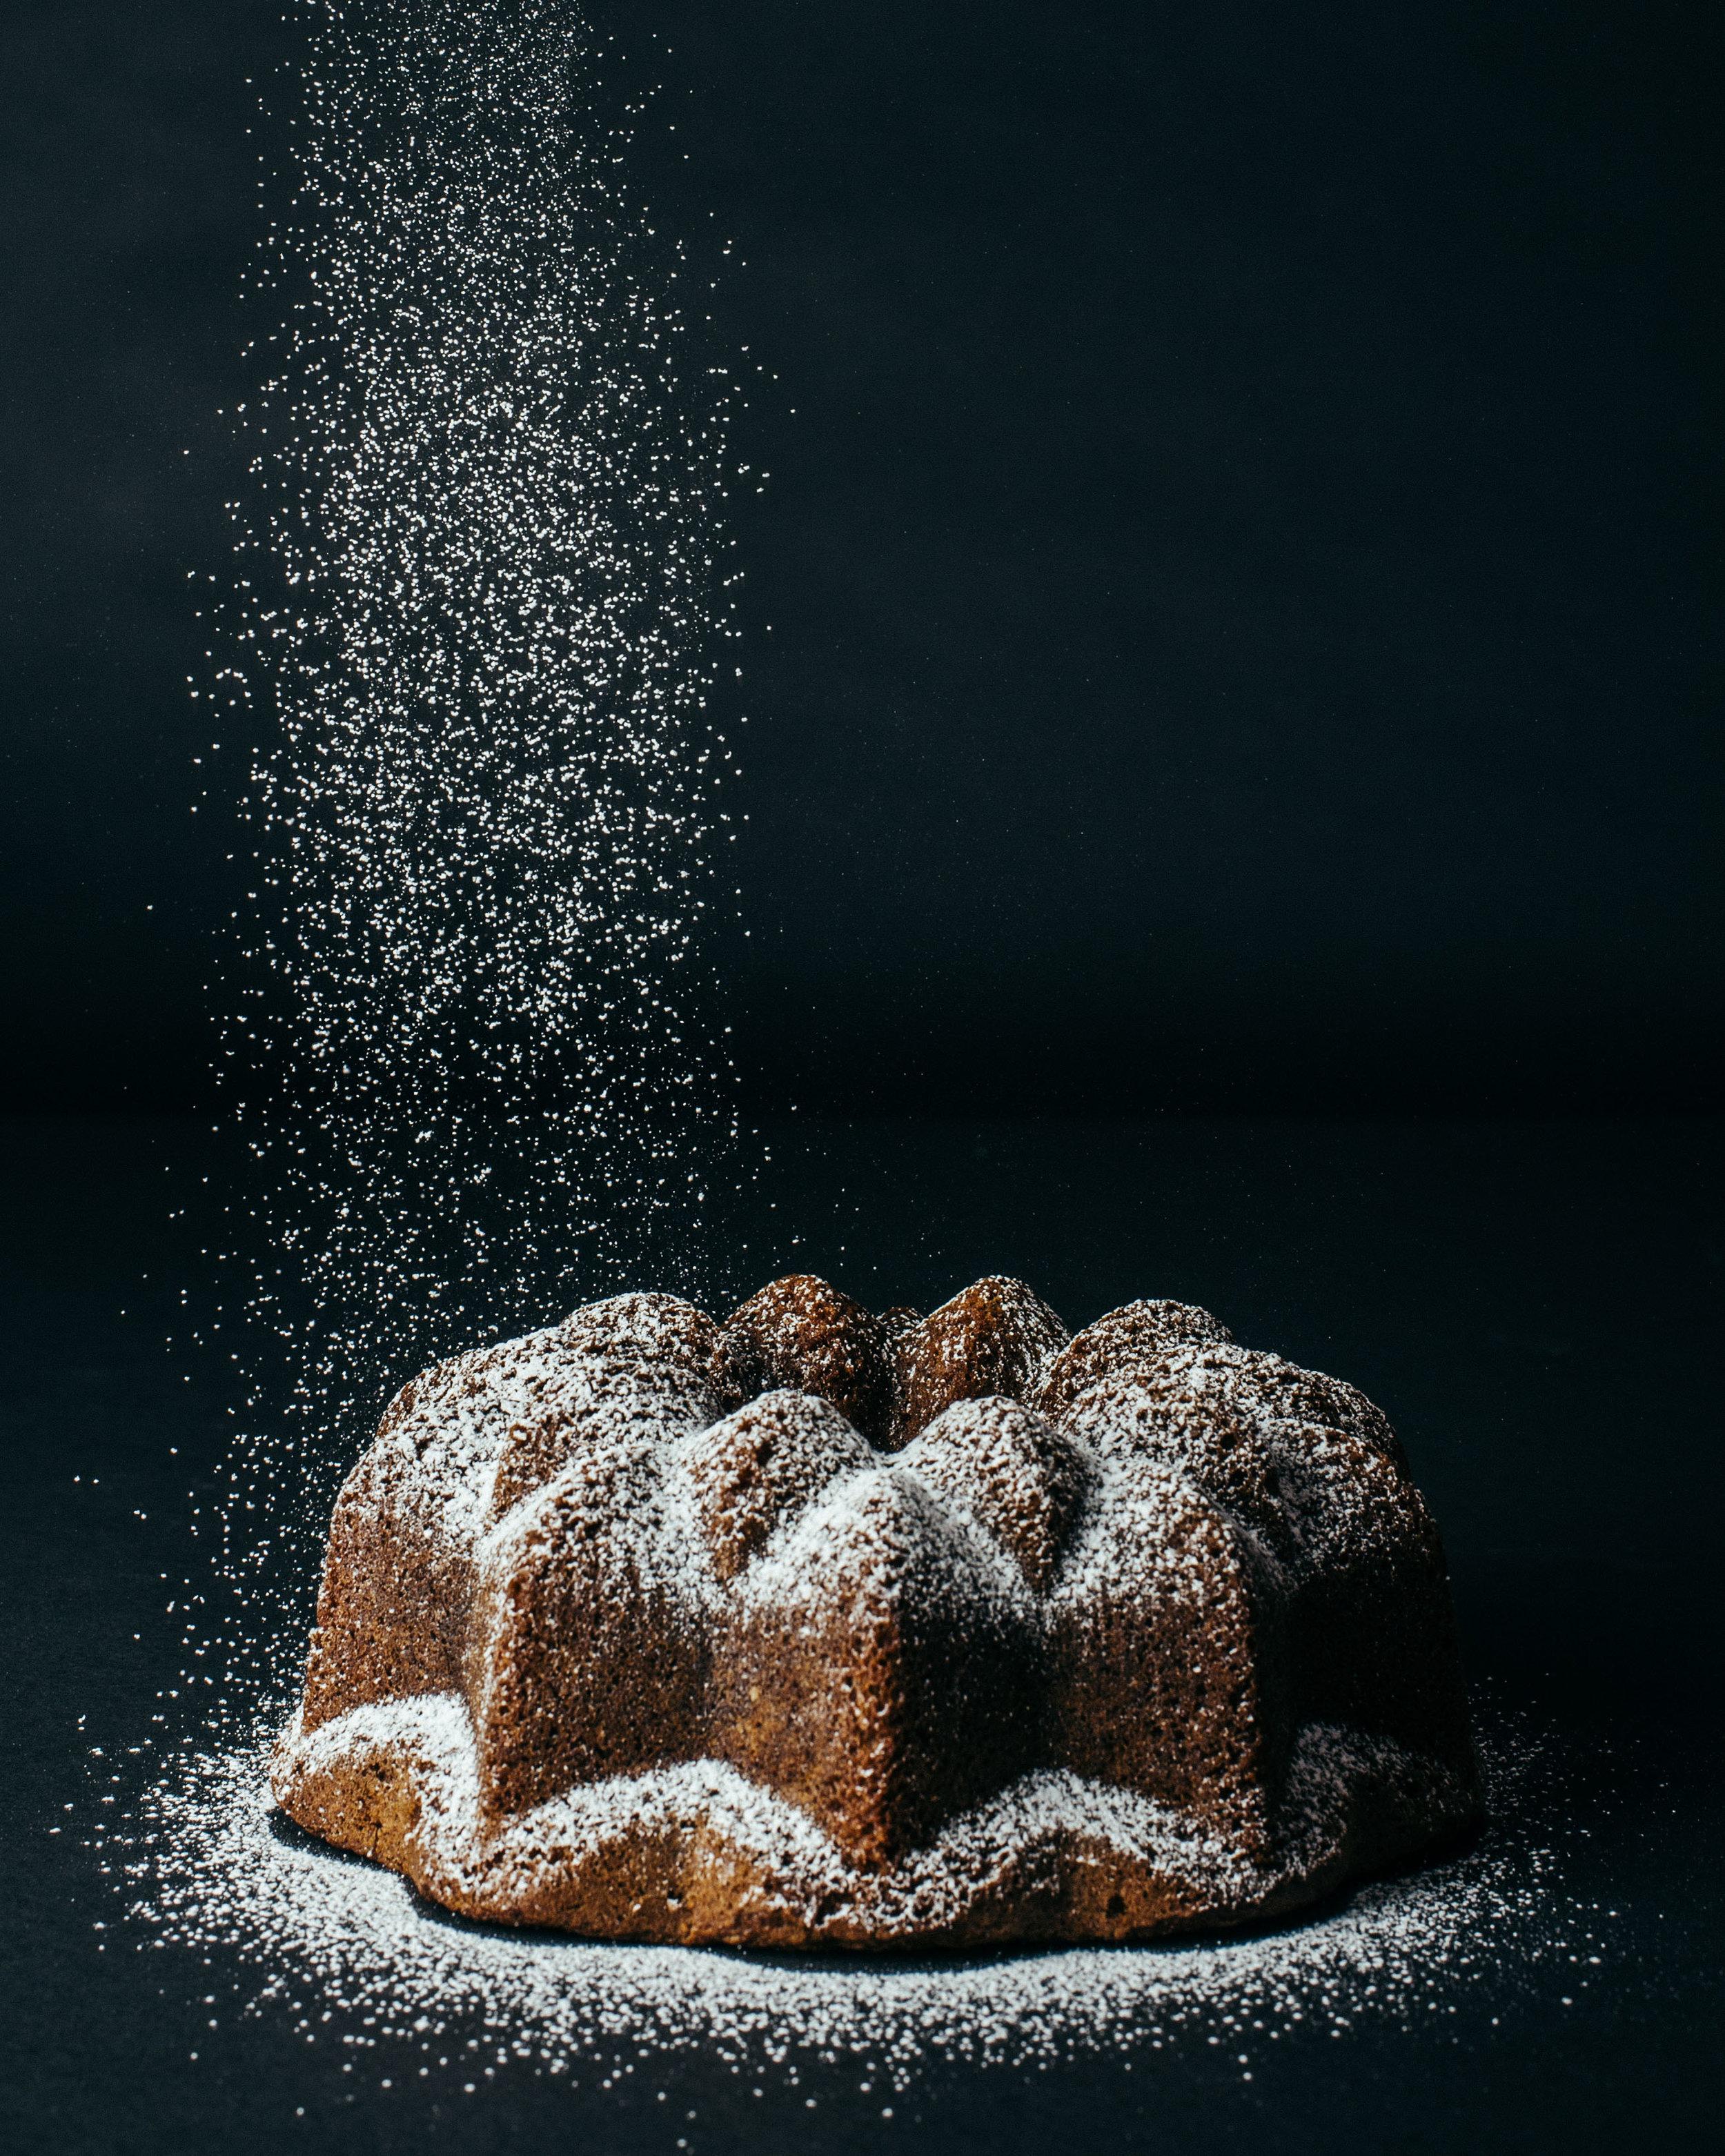 cake-004 copy.jpg